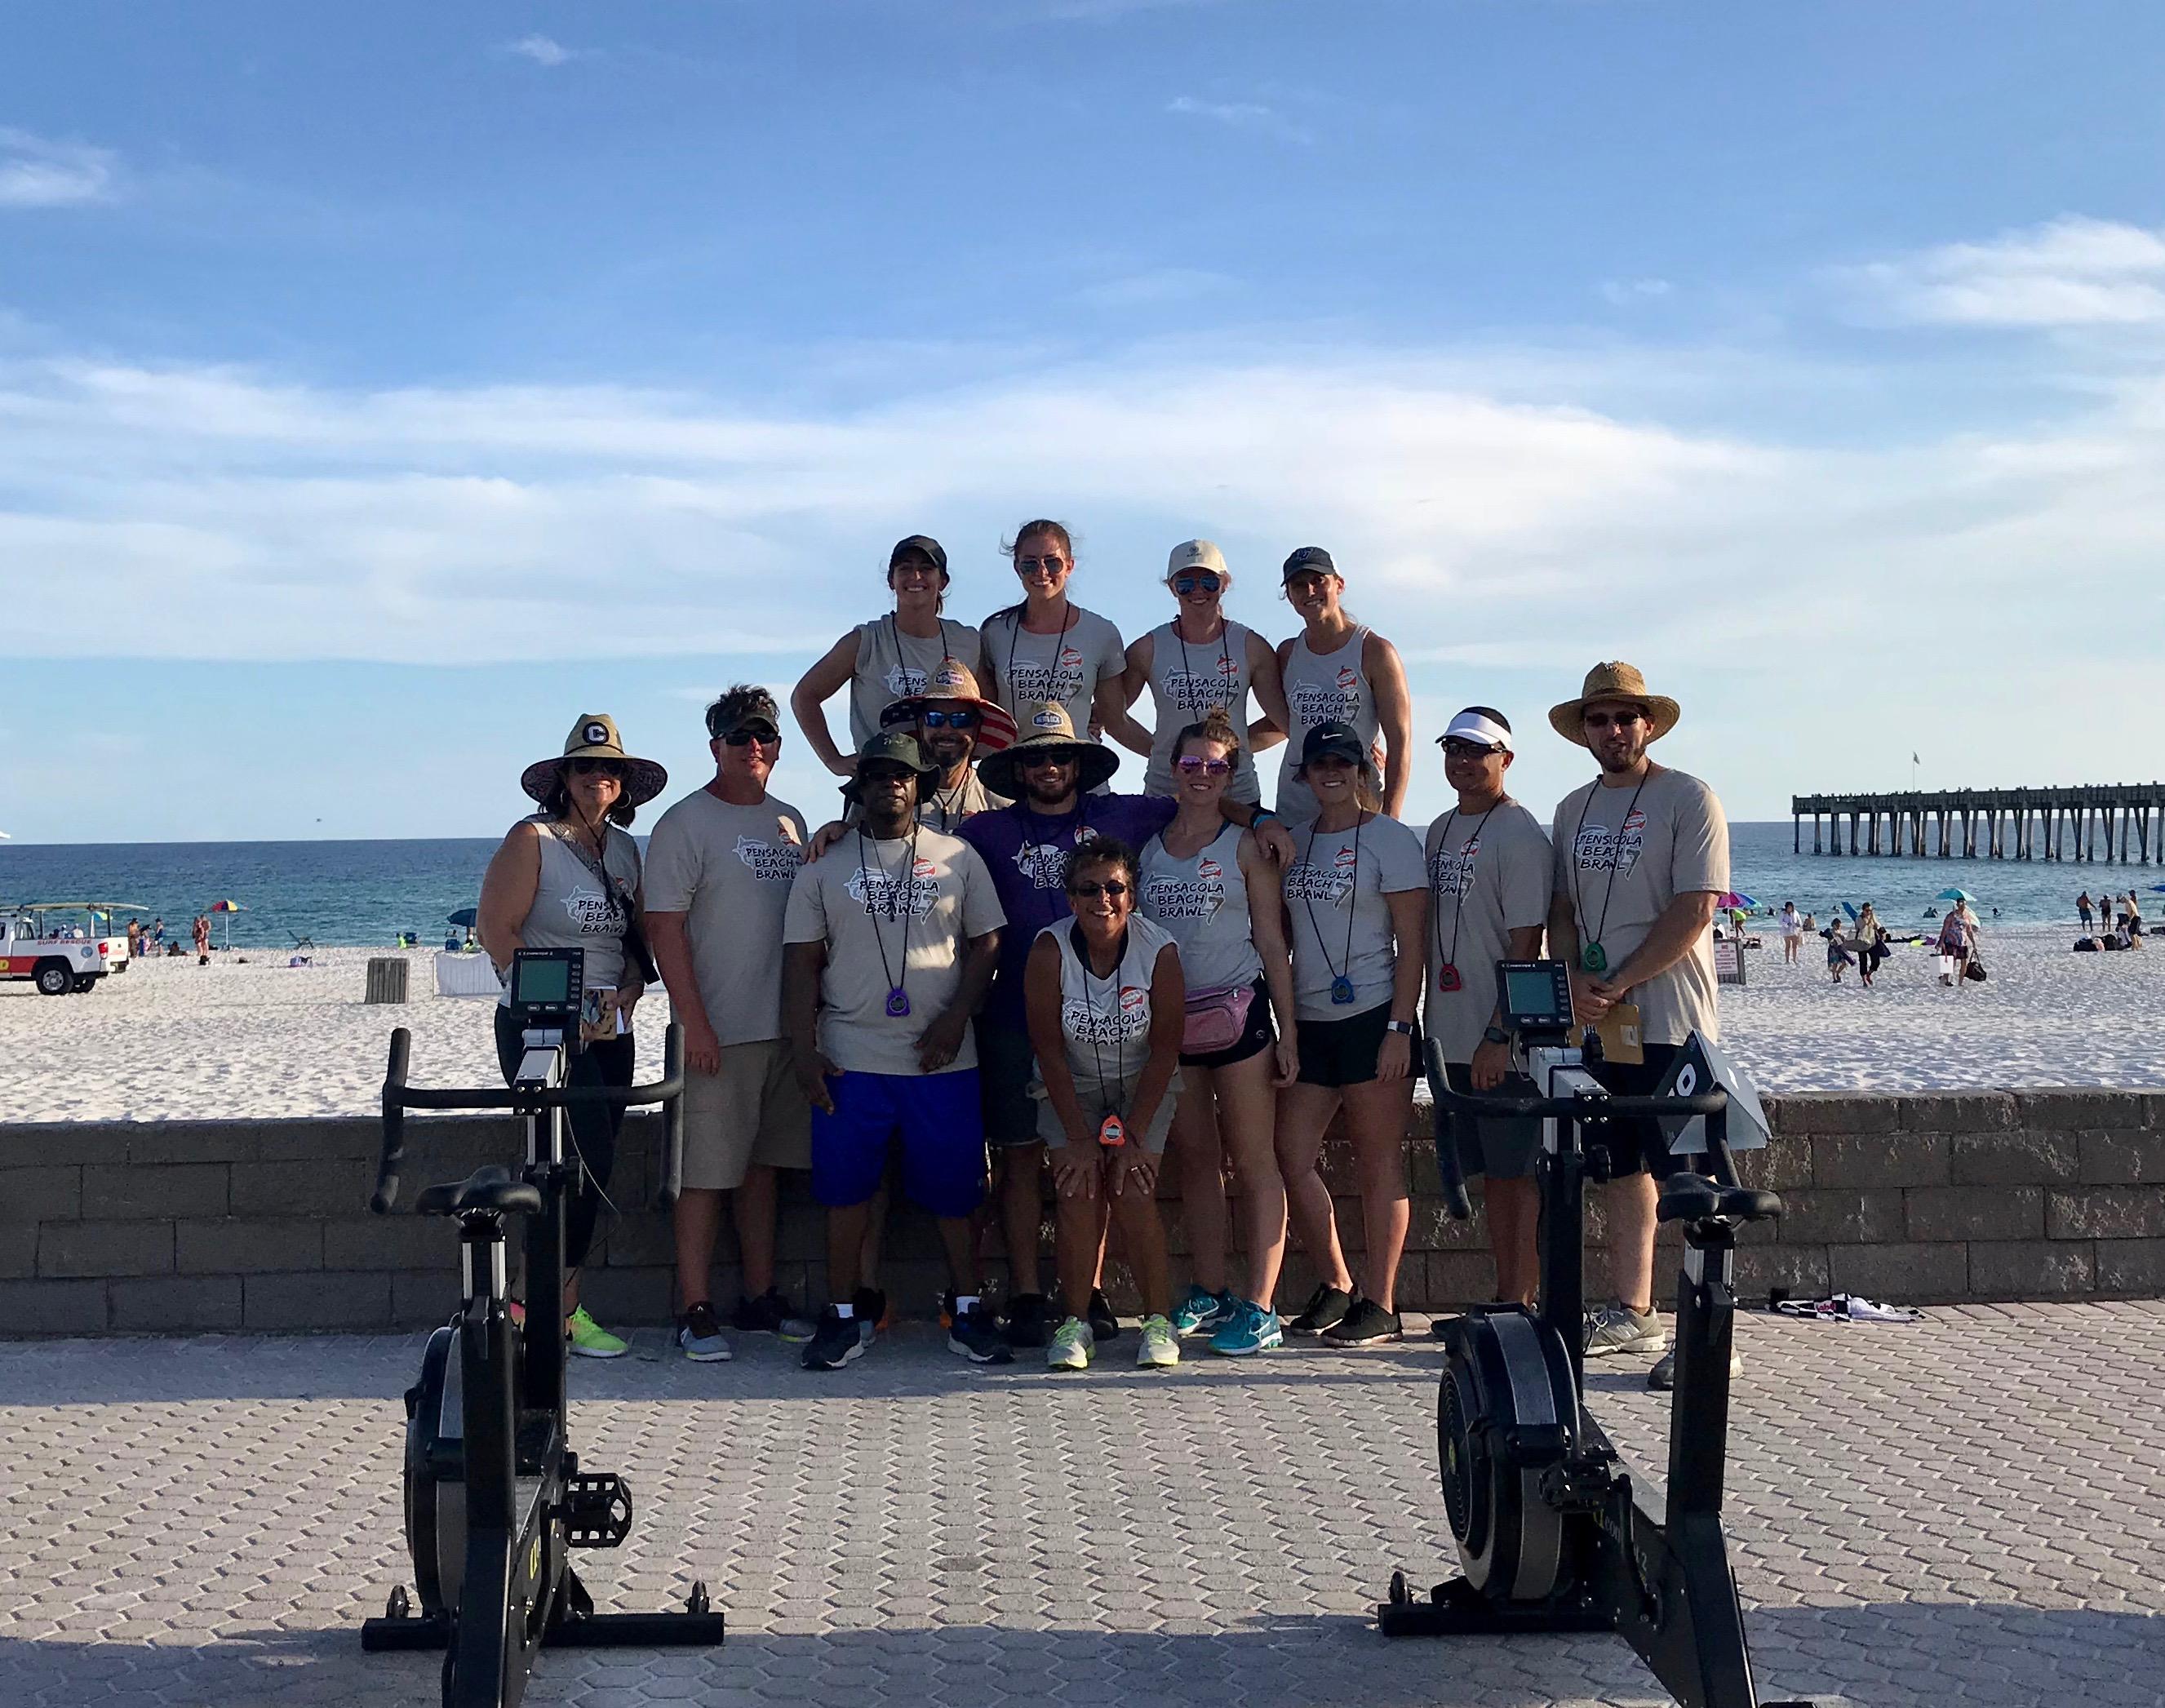 Beach Brawl Volunteers at beach